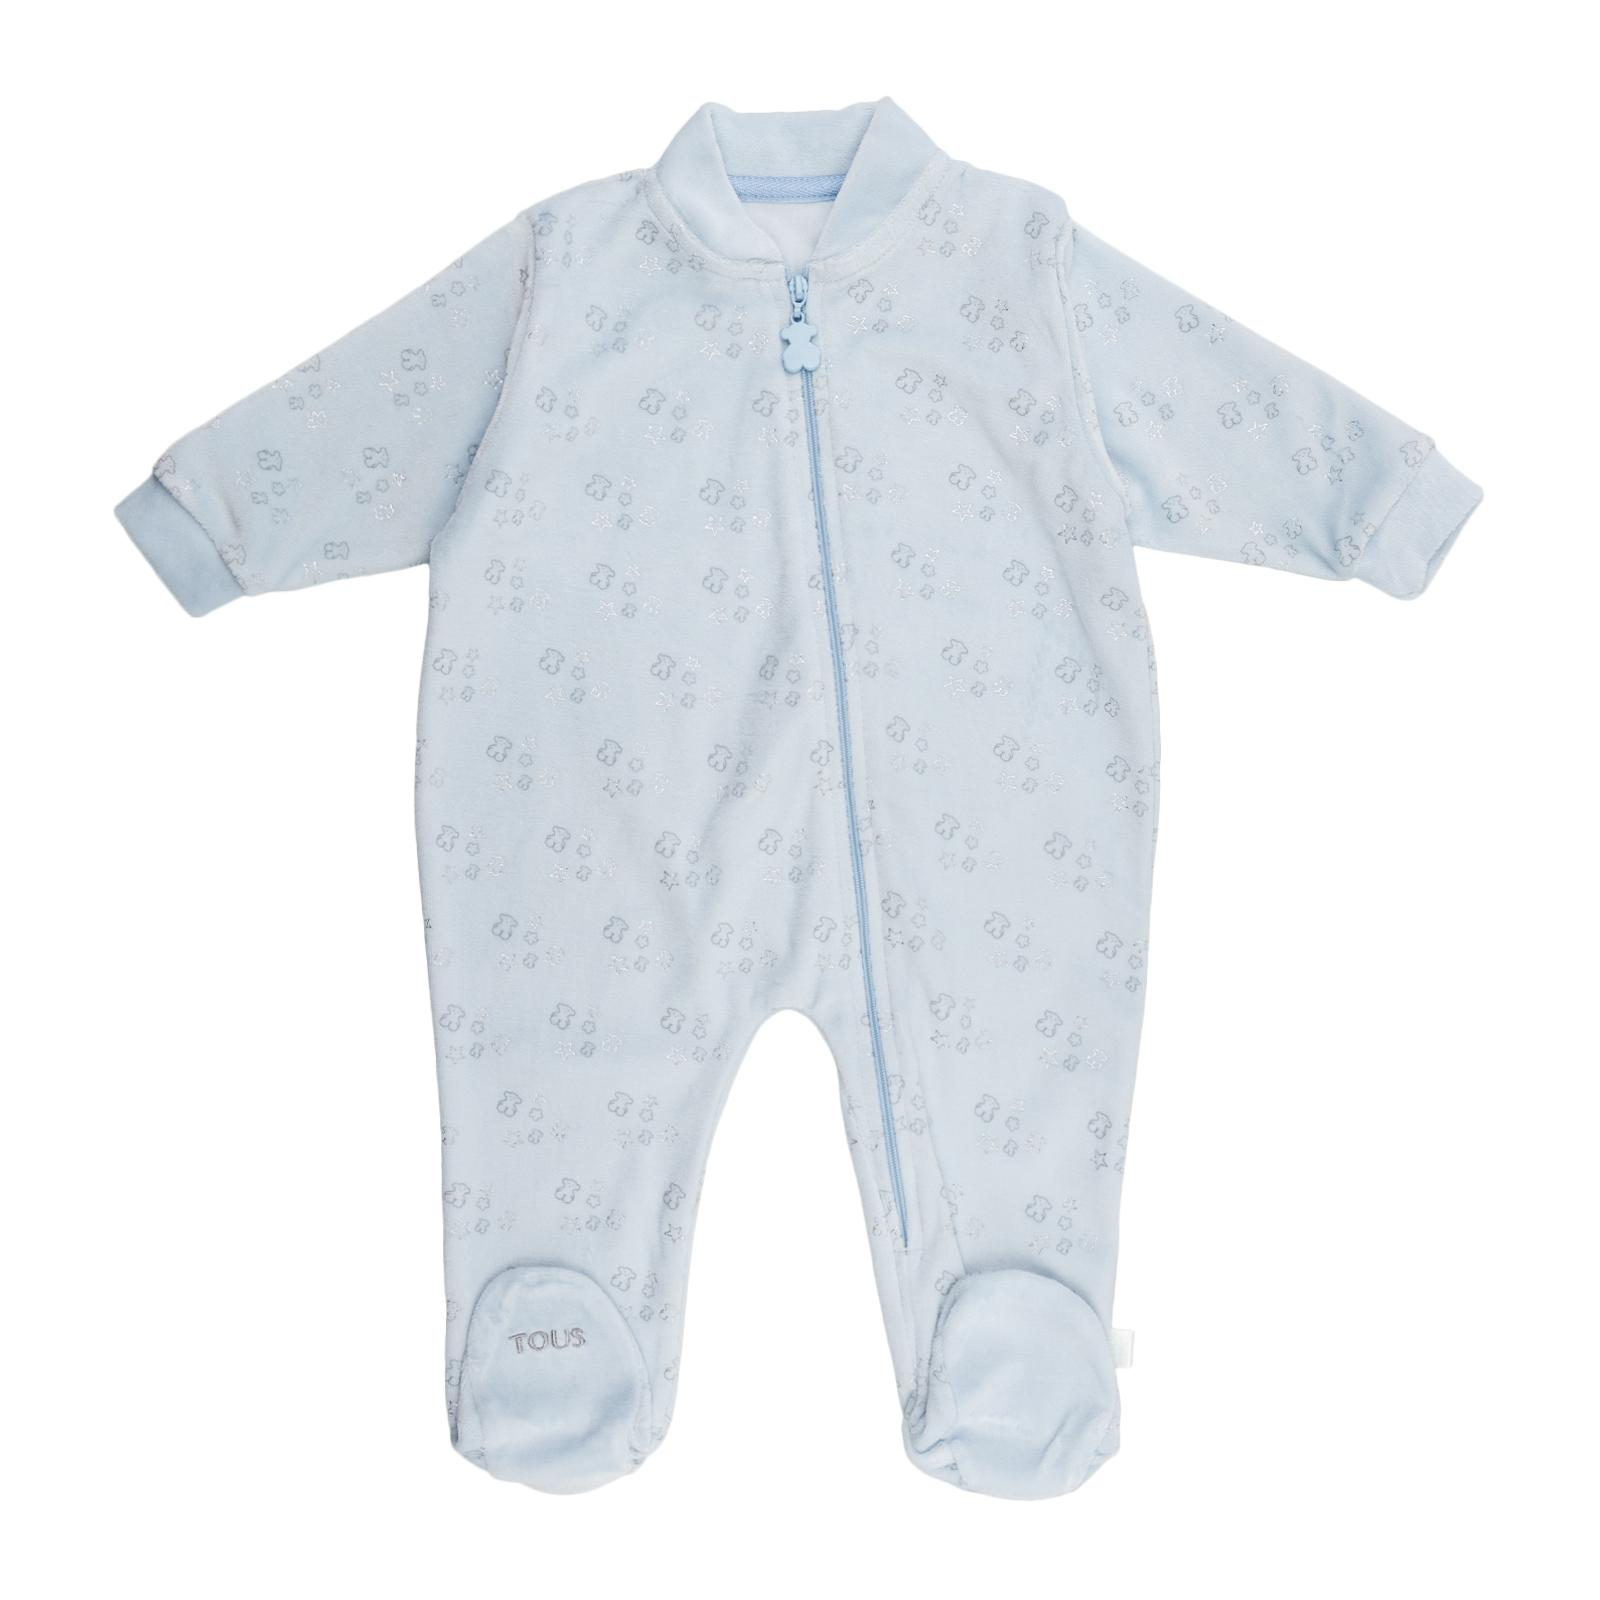 Pelele Baby Tous mod. ConstelT color celeste.